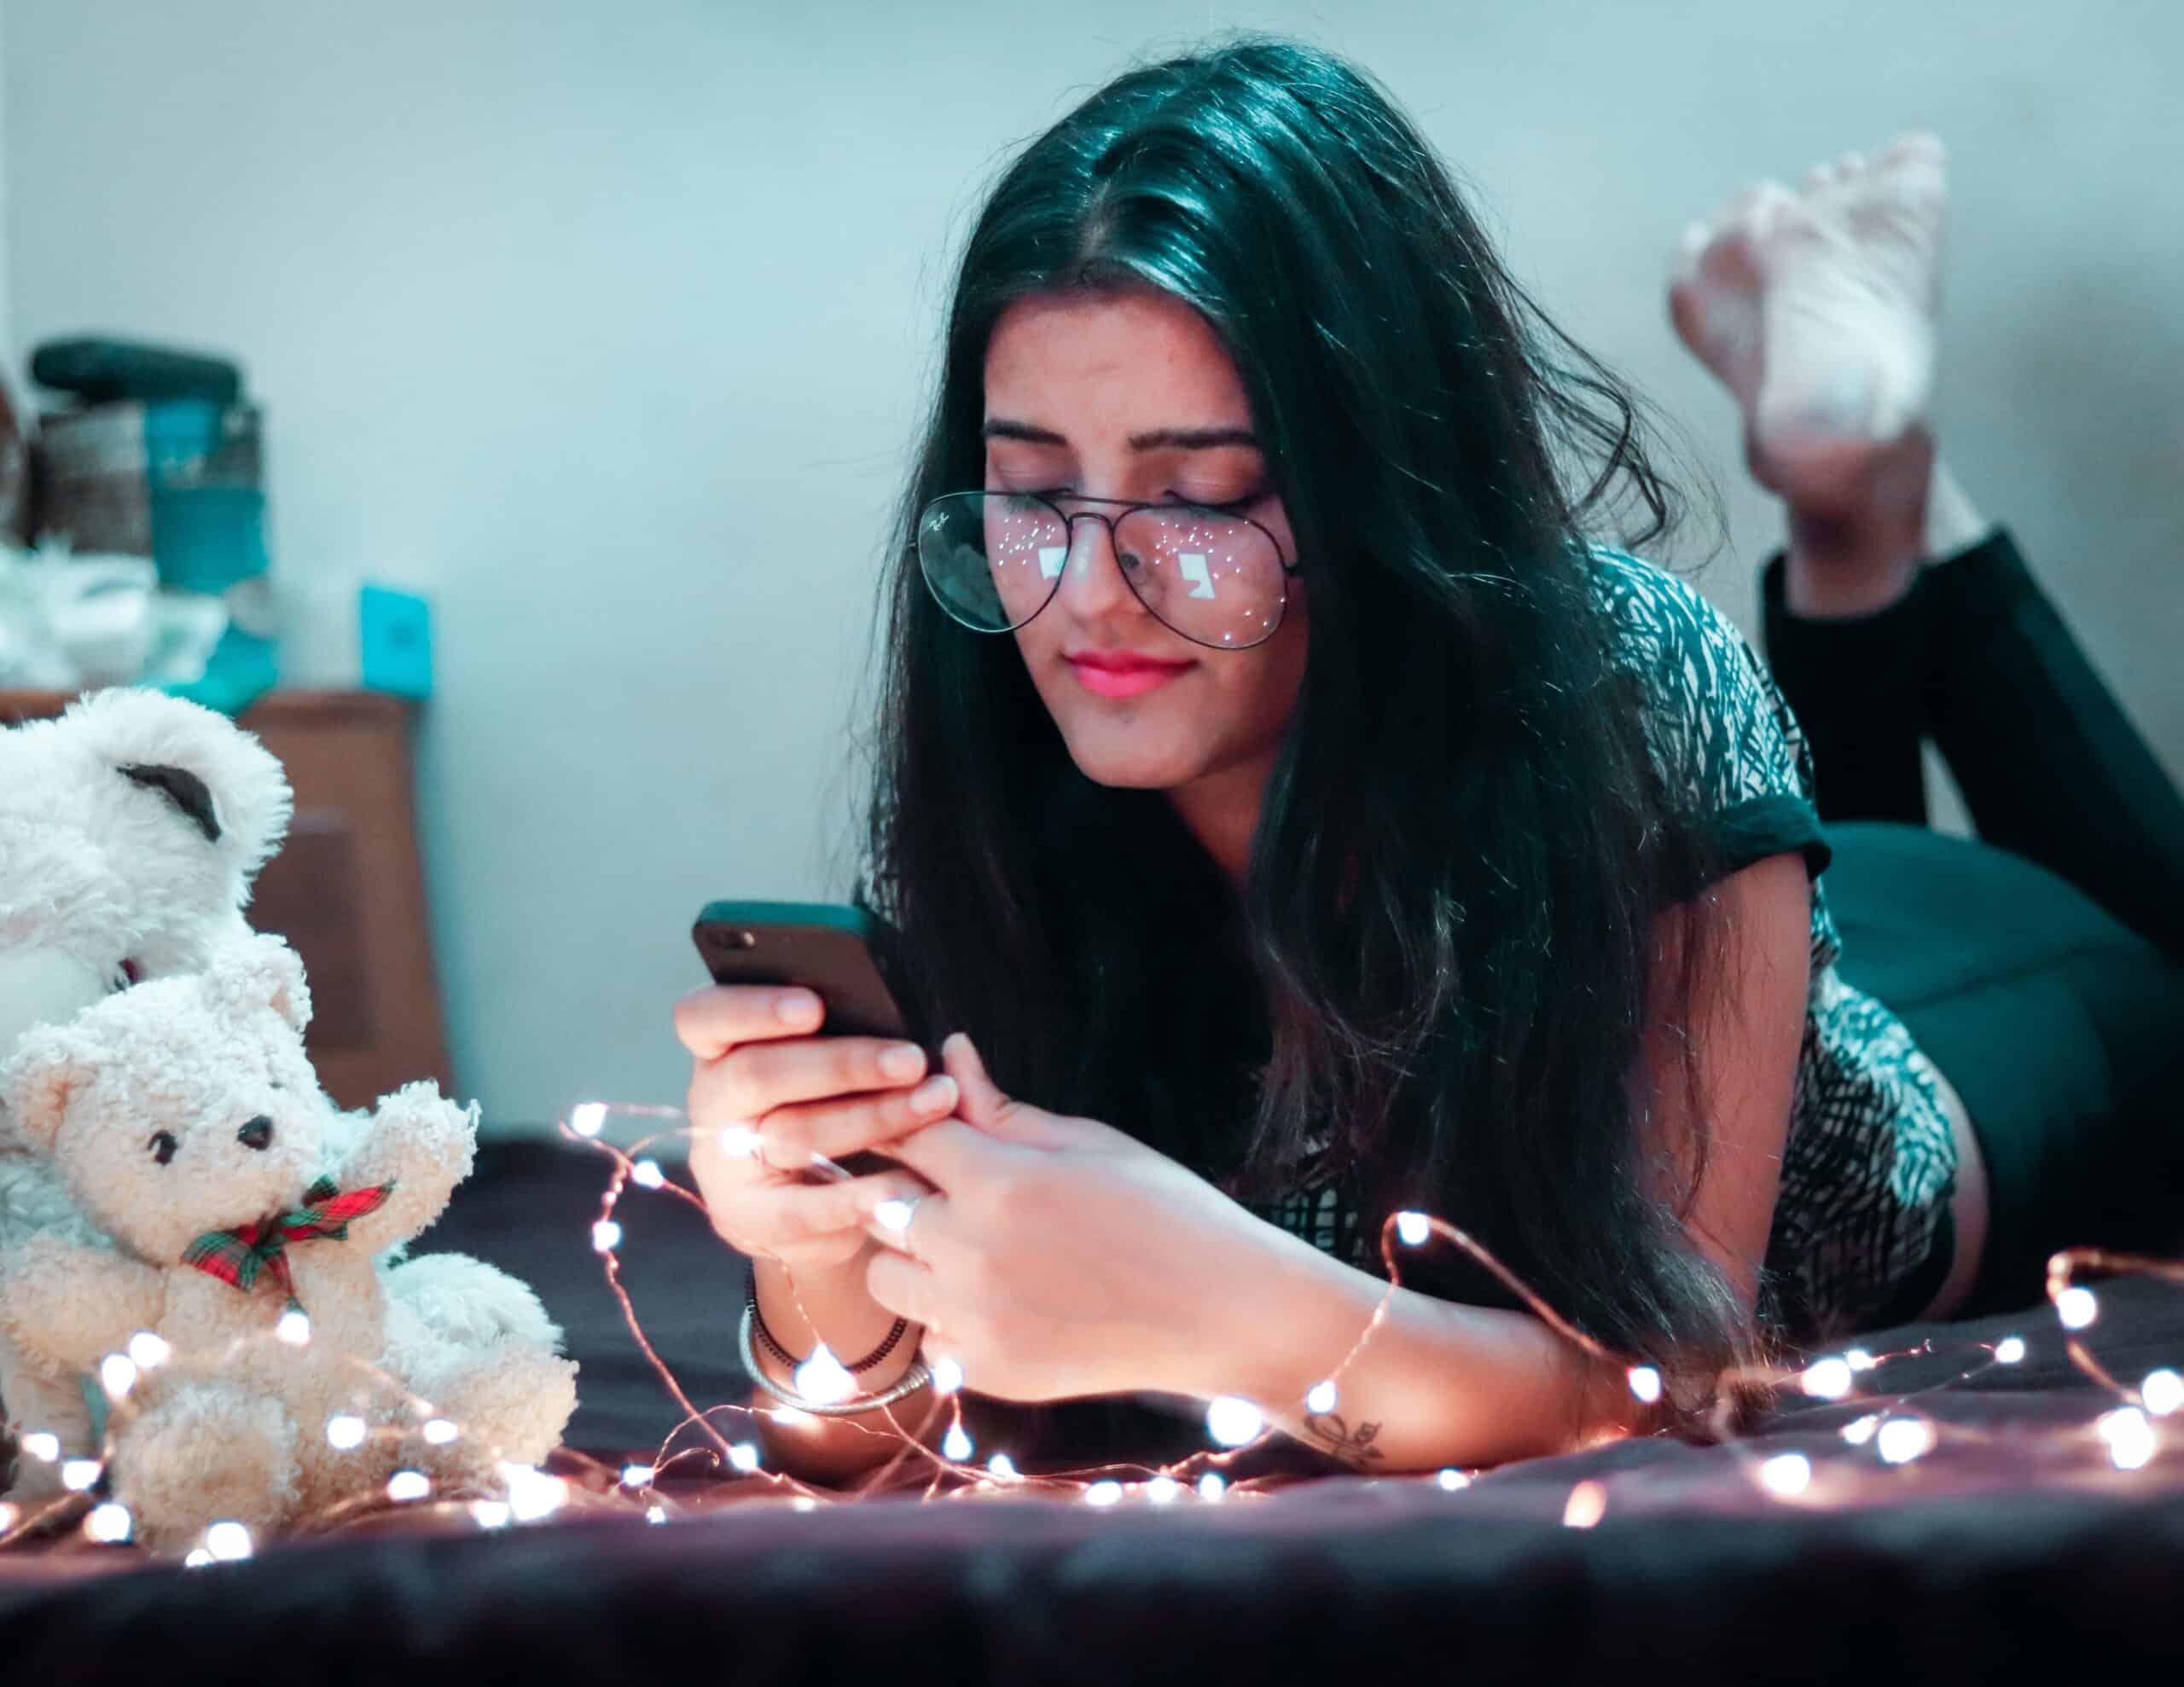 woman-texting